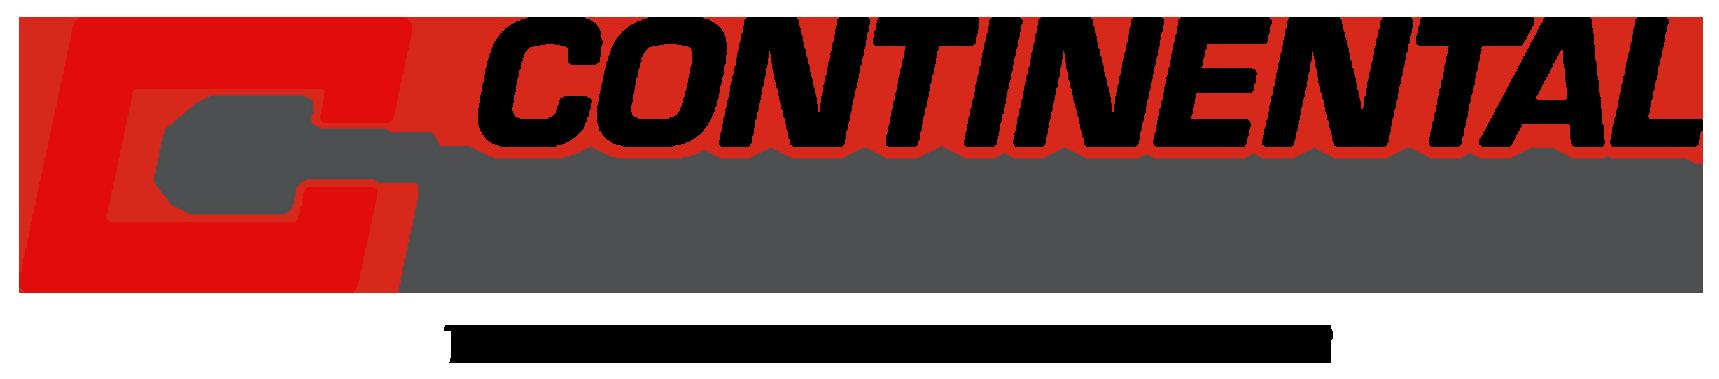 PER198636090